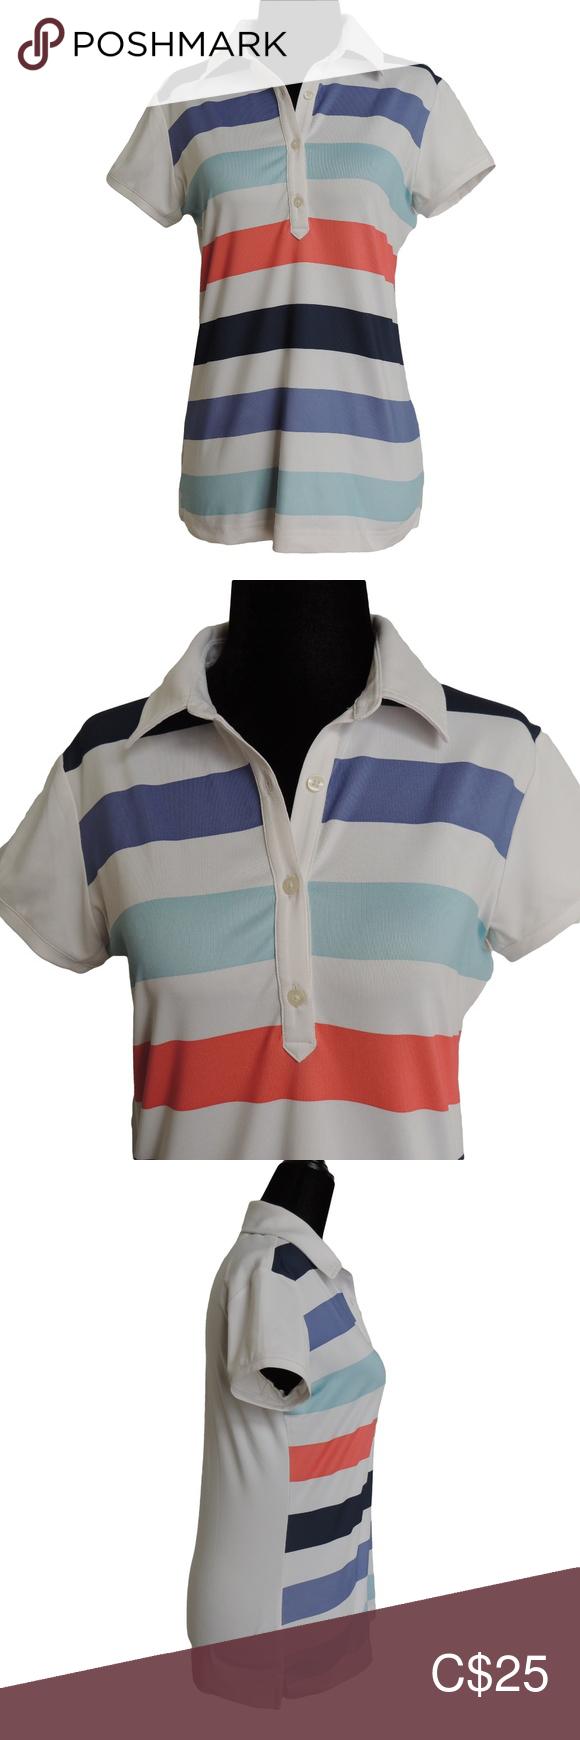 ADIDAS Striped Climacool Short Sleeve Golf Polo S